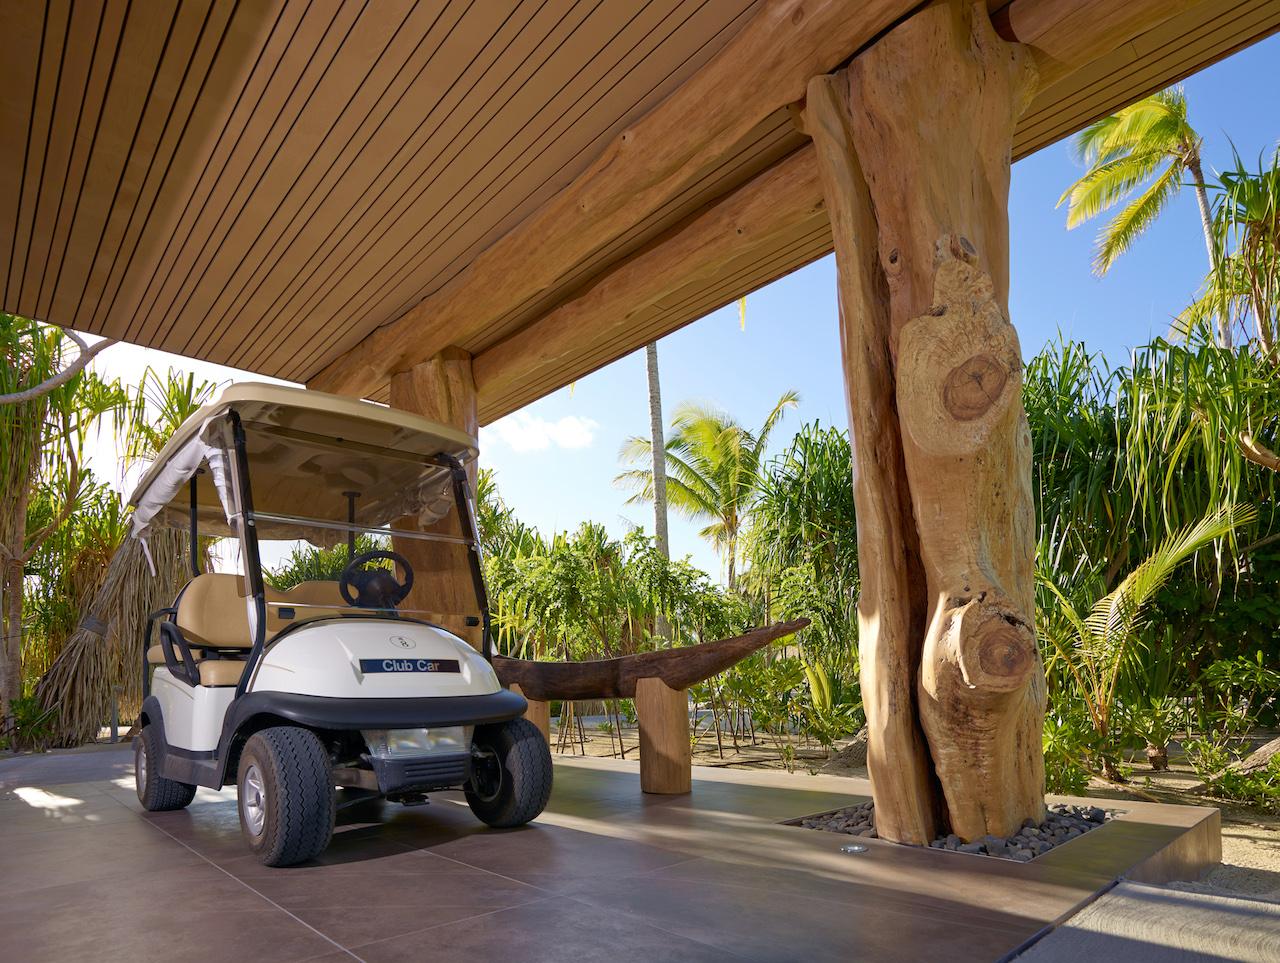 BRANDO_Golf-car.jpg